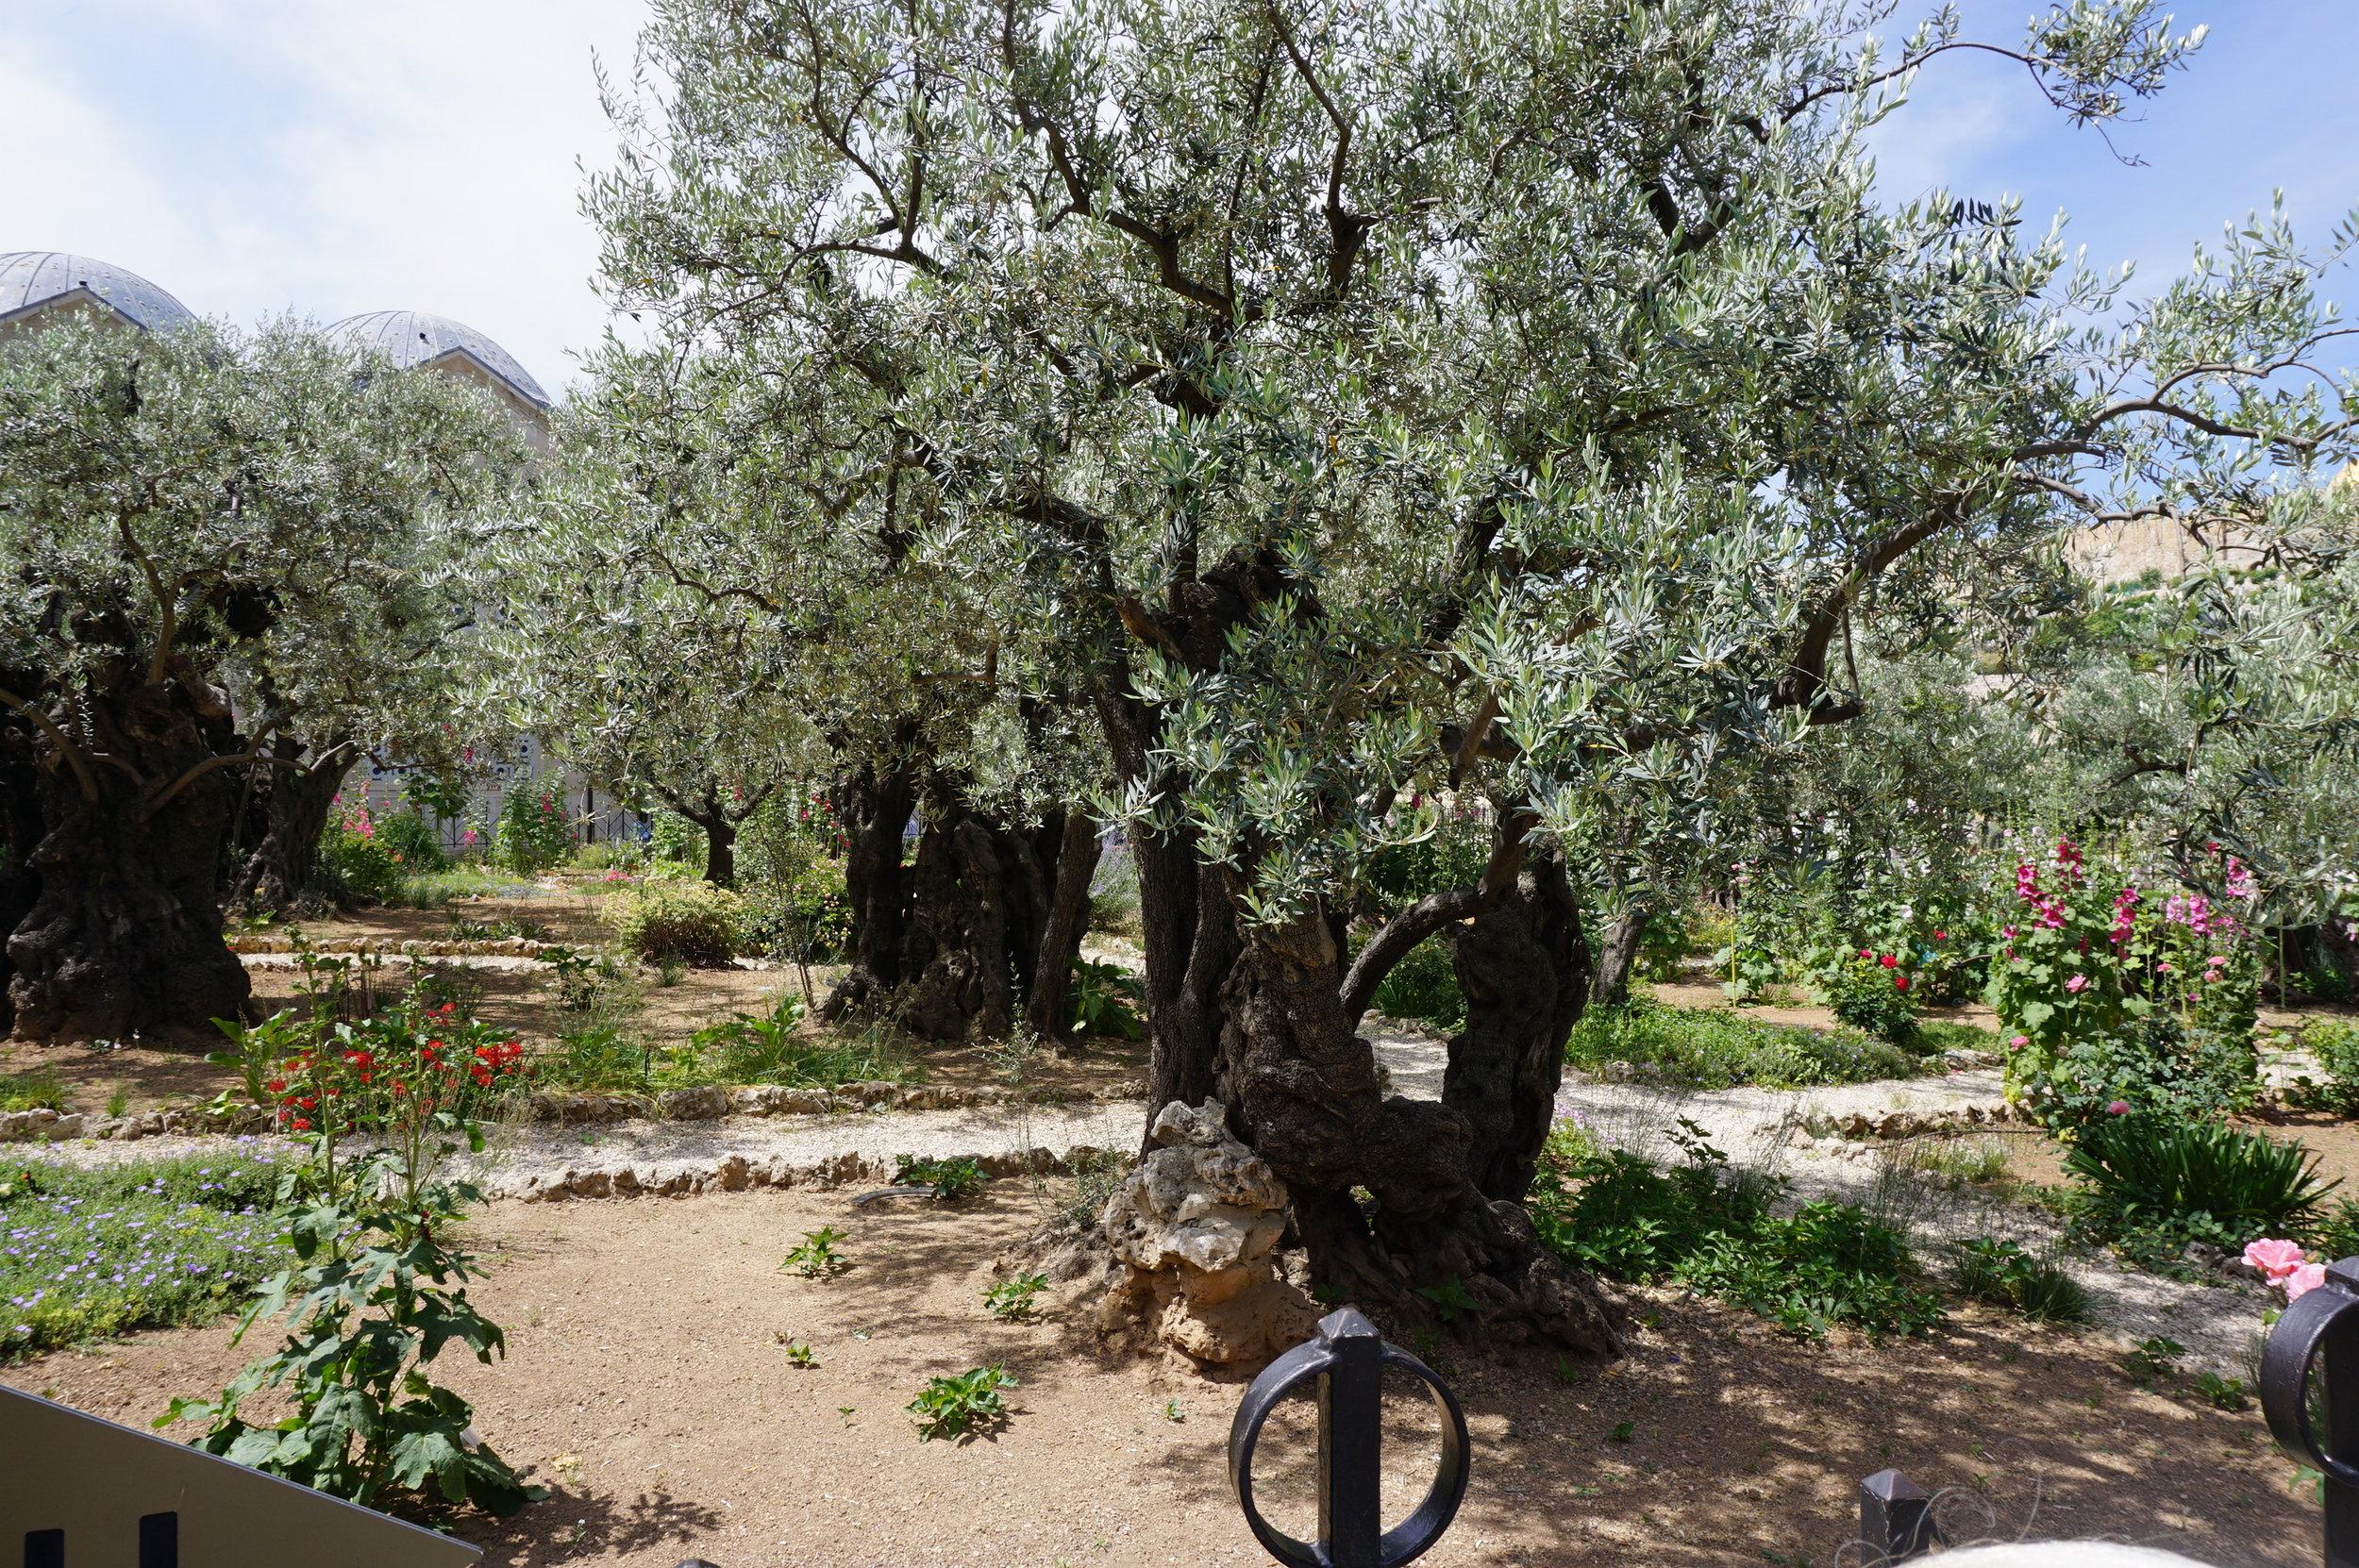 Garden of Gethsemane Jerusalem Israel.JPG